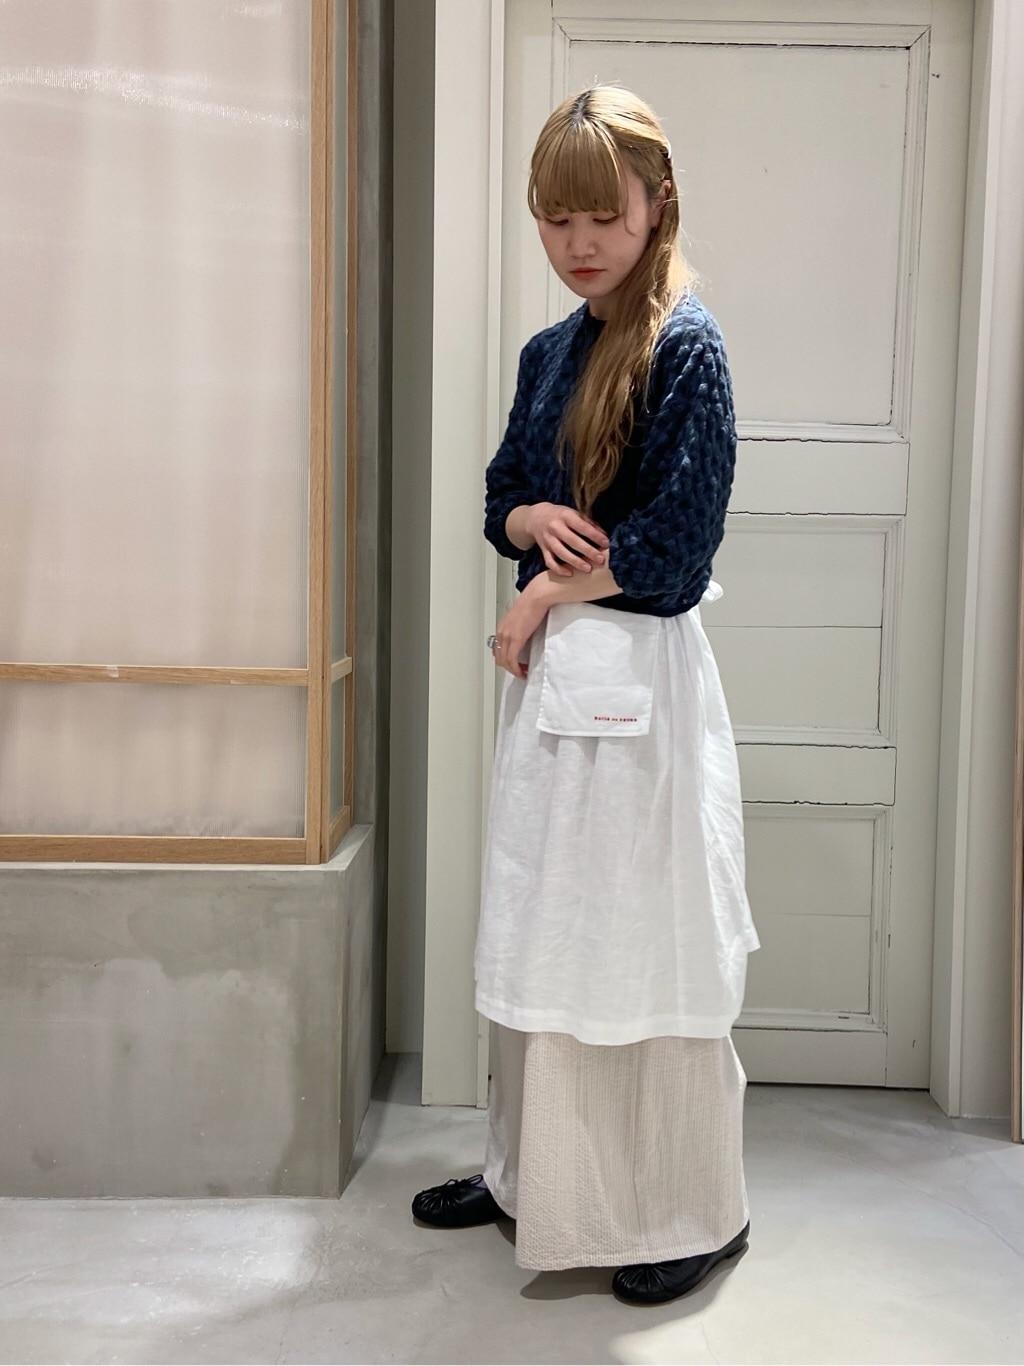 bulle de savon 渋谷スクランブルスクエア 身長:160cm 2021.03.21